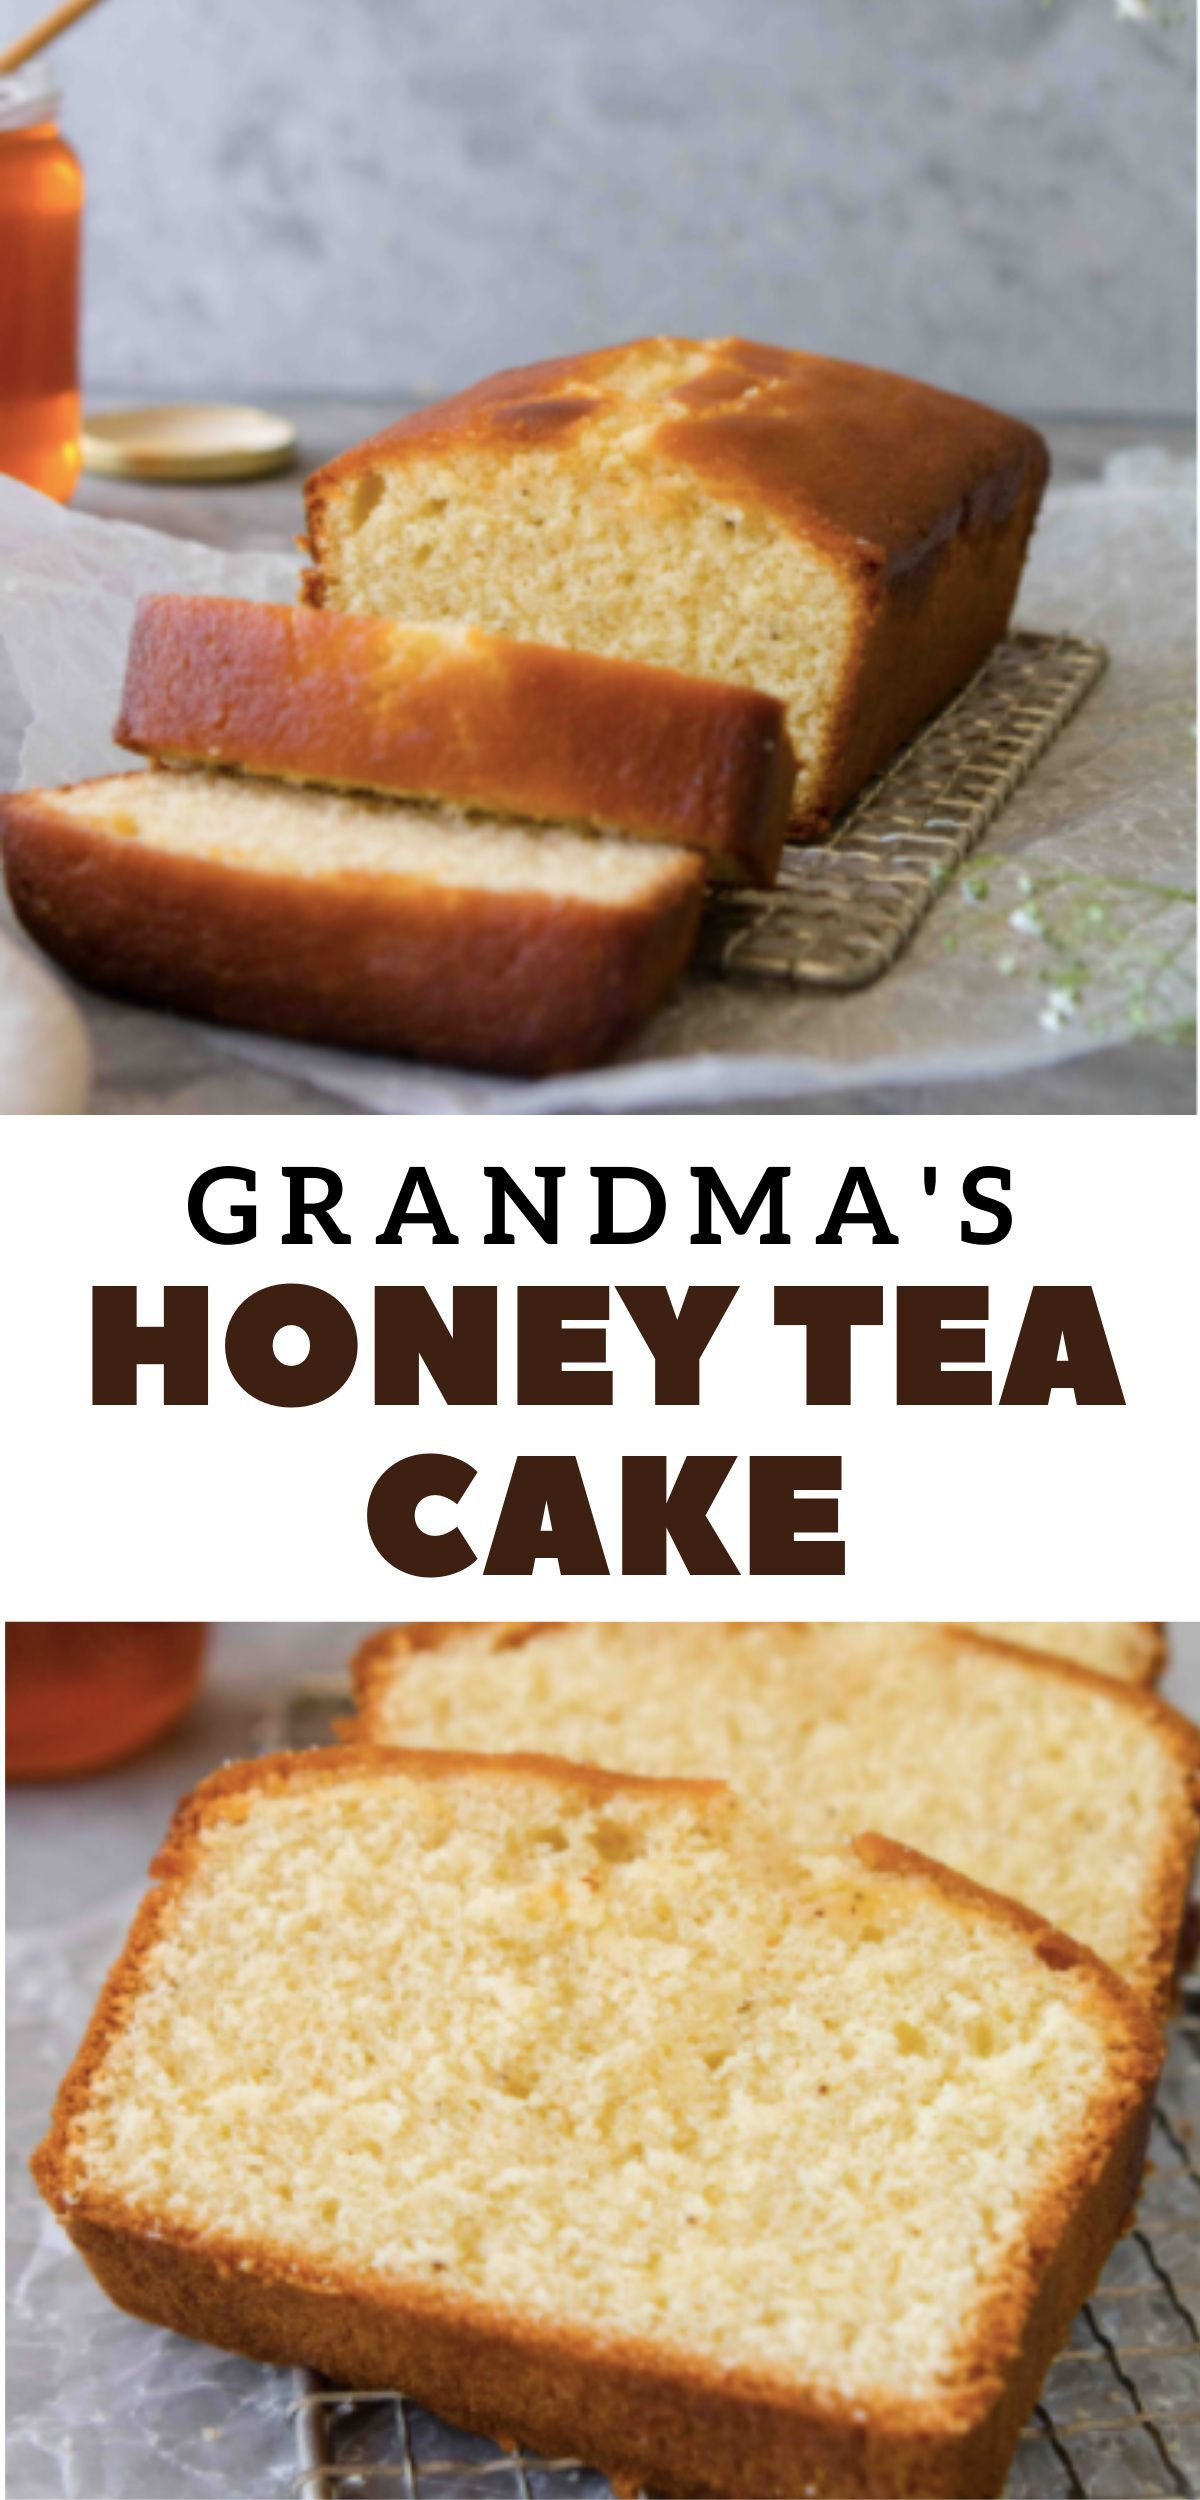 Moist Honey Tea Cake Loaf Just Like Grandma S Lifestyle Of A Foodie Recipe In 2020 Food Recipes Foodie